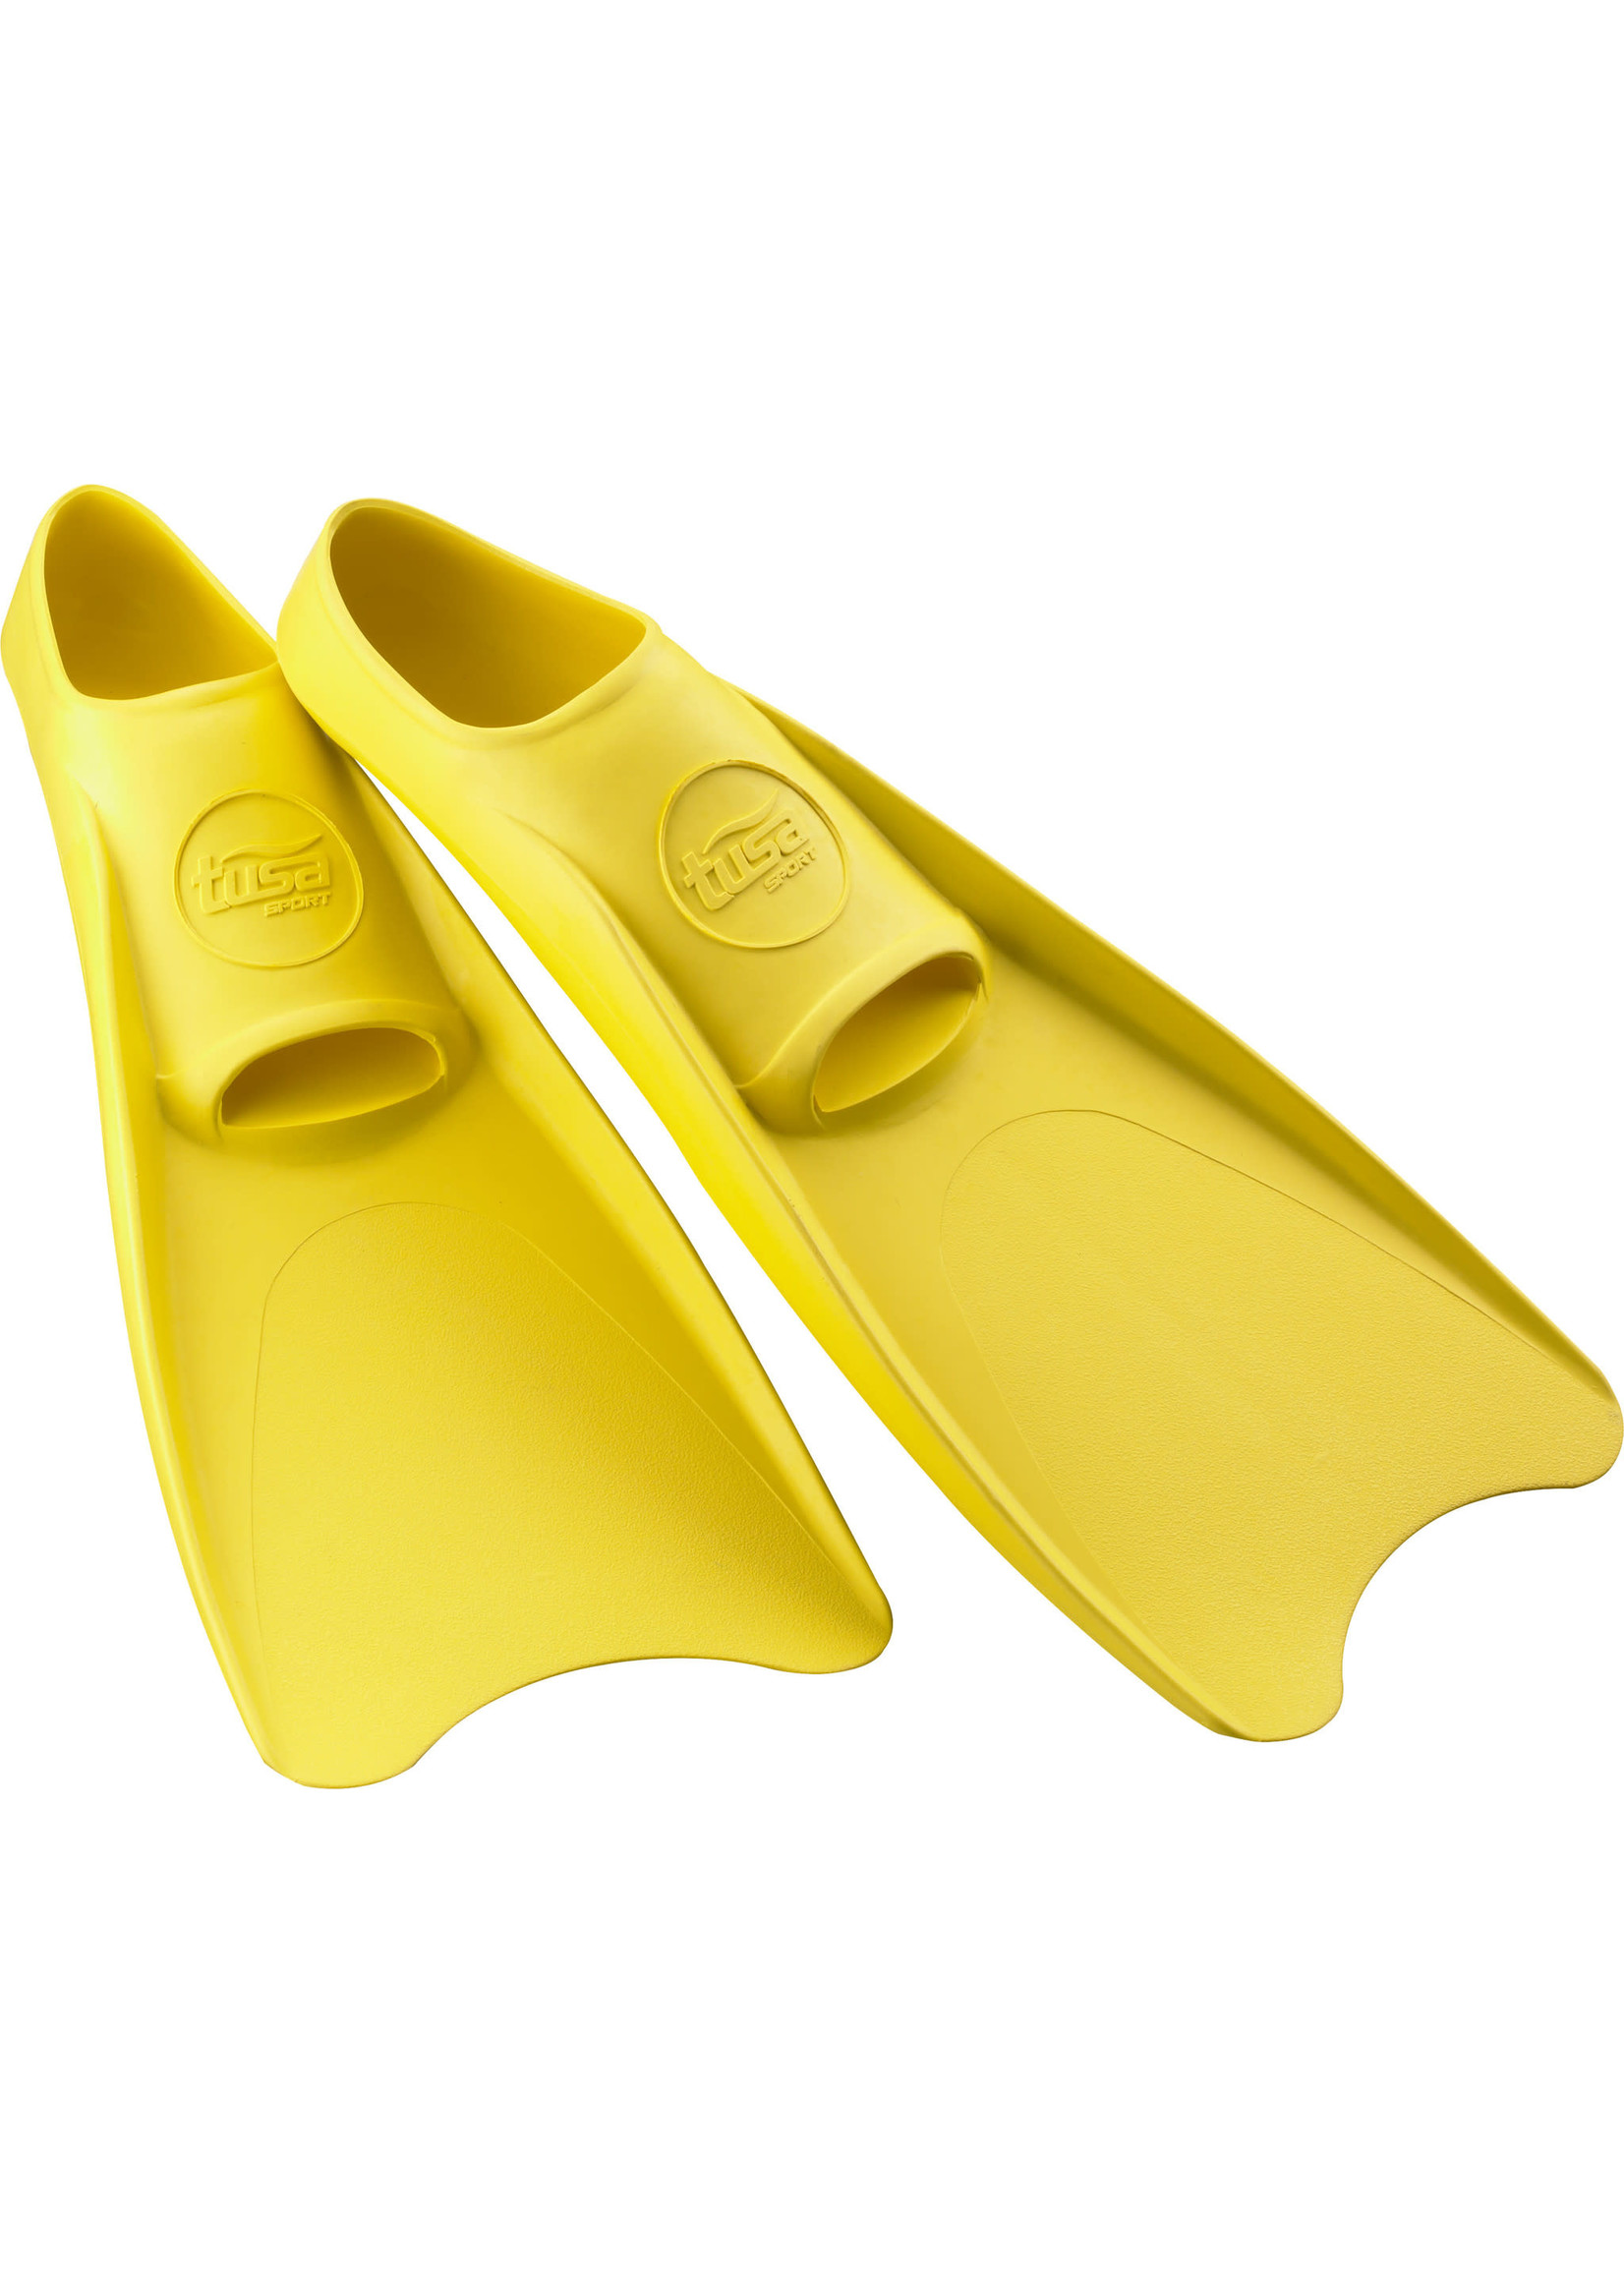 TUSA TUSA Full Foot Rubber Fin - diverse kleuren